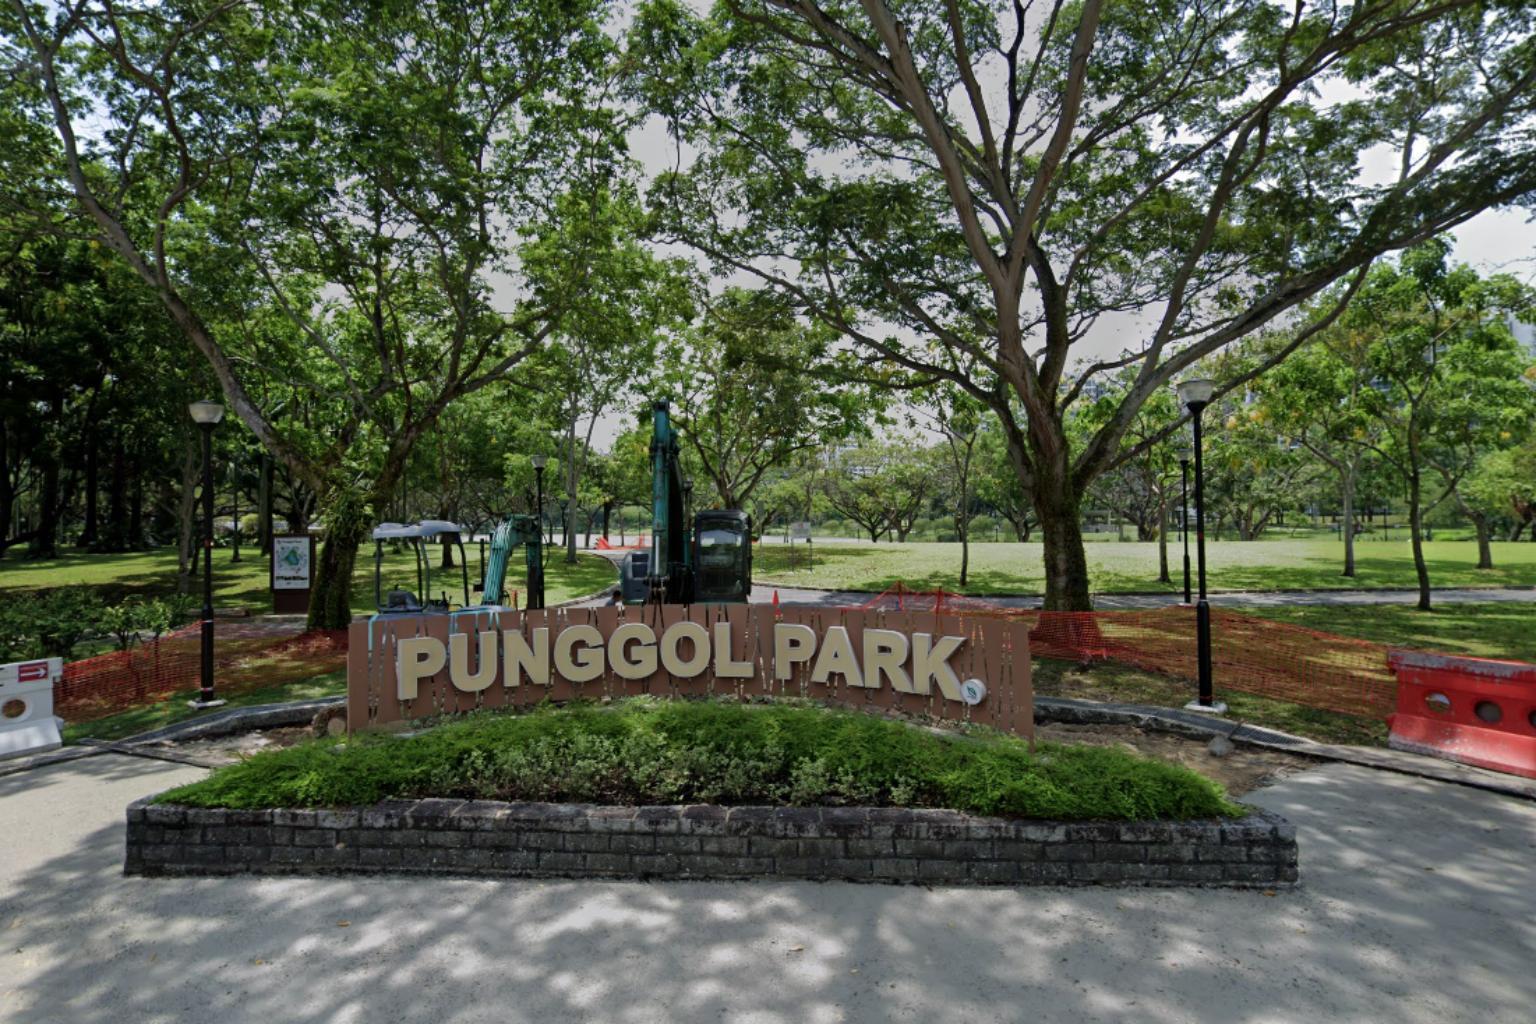 Punggol Park